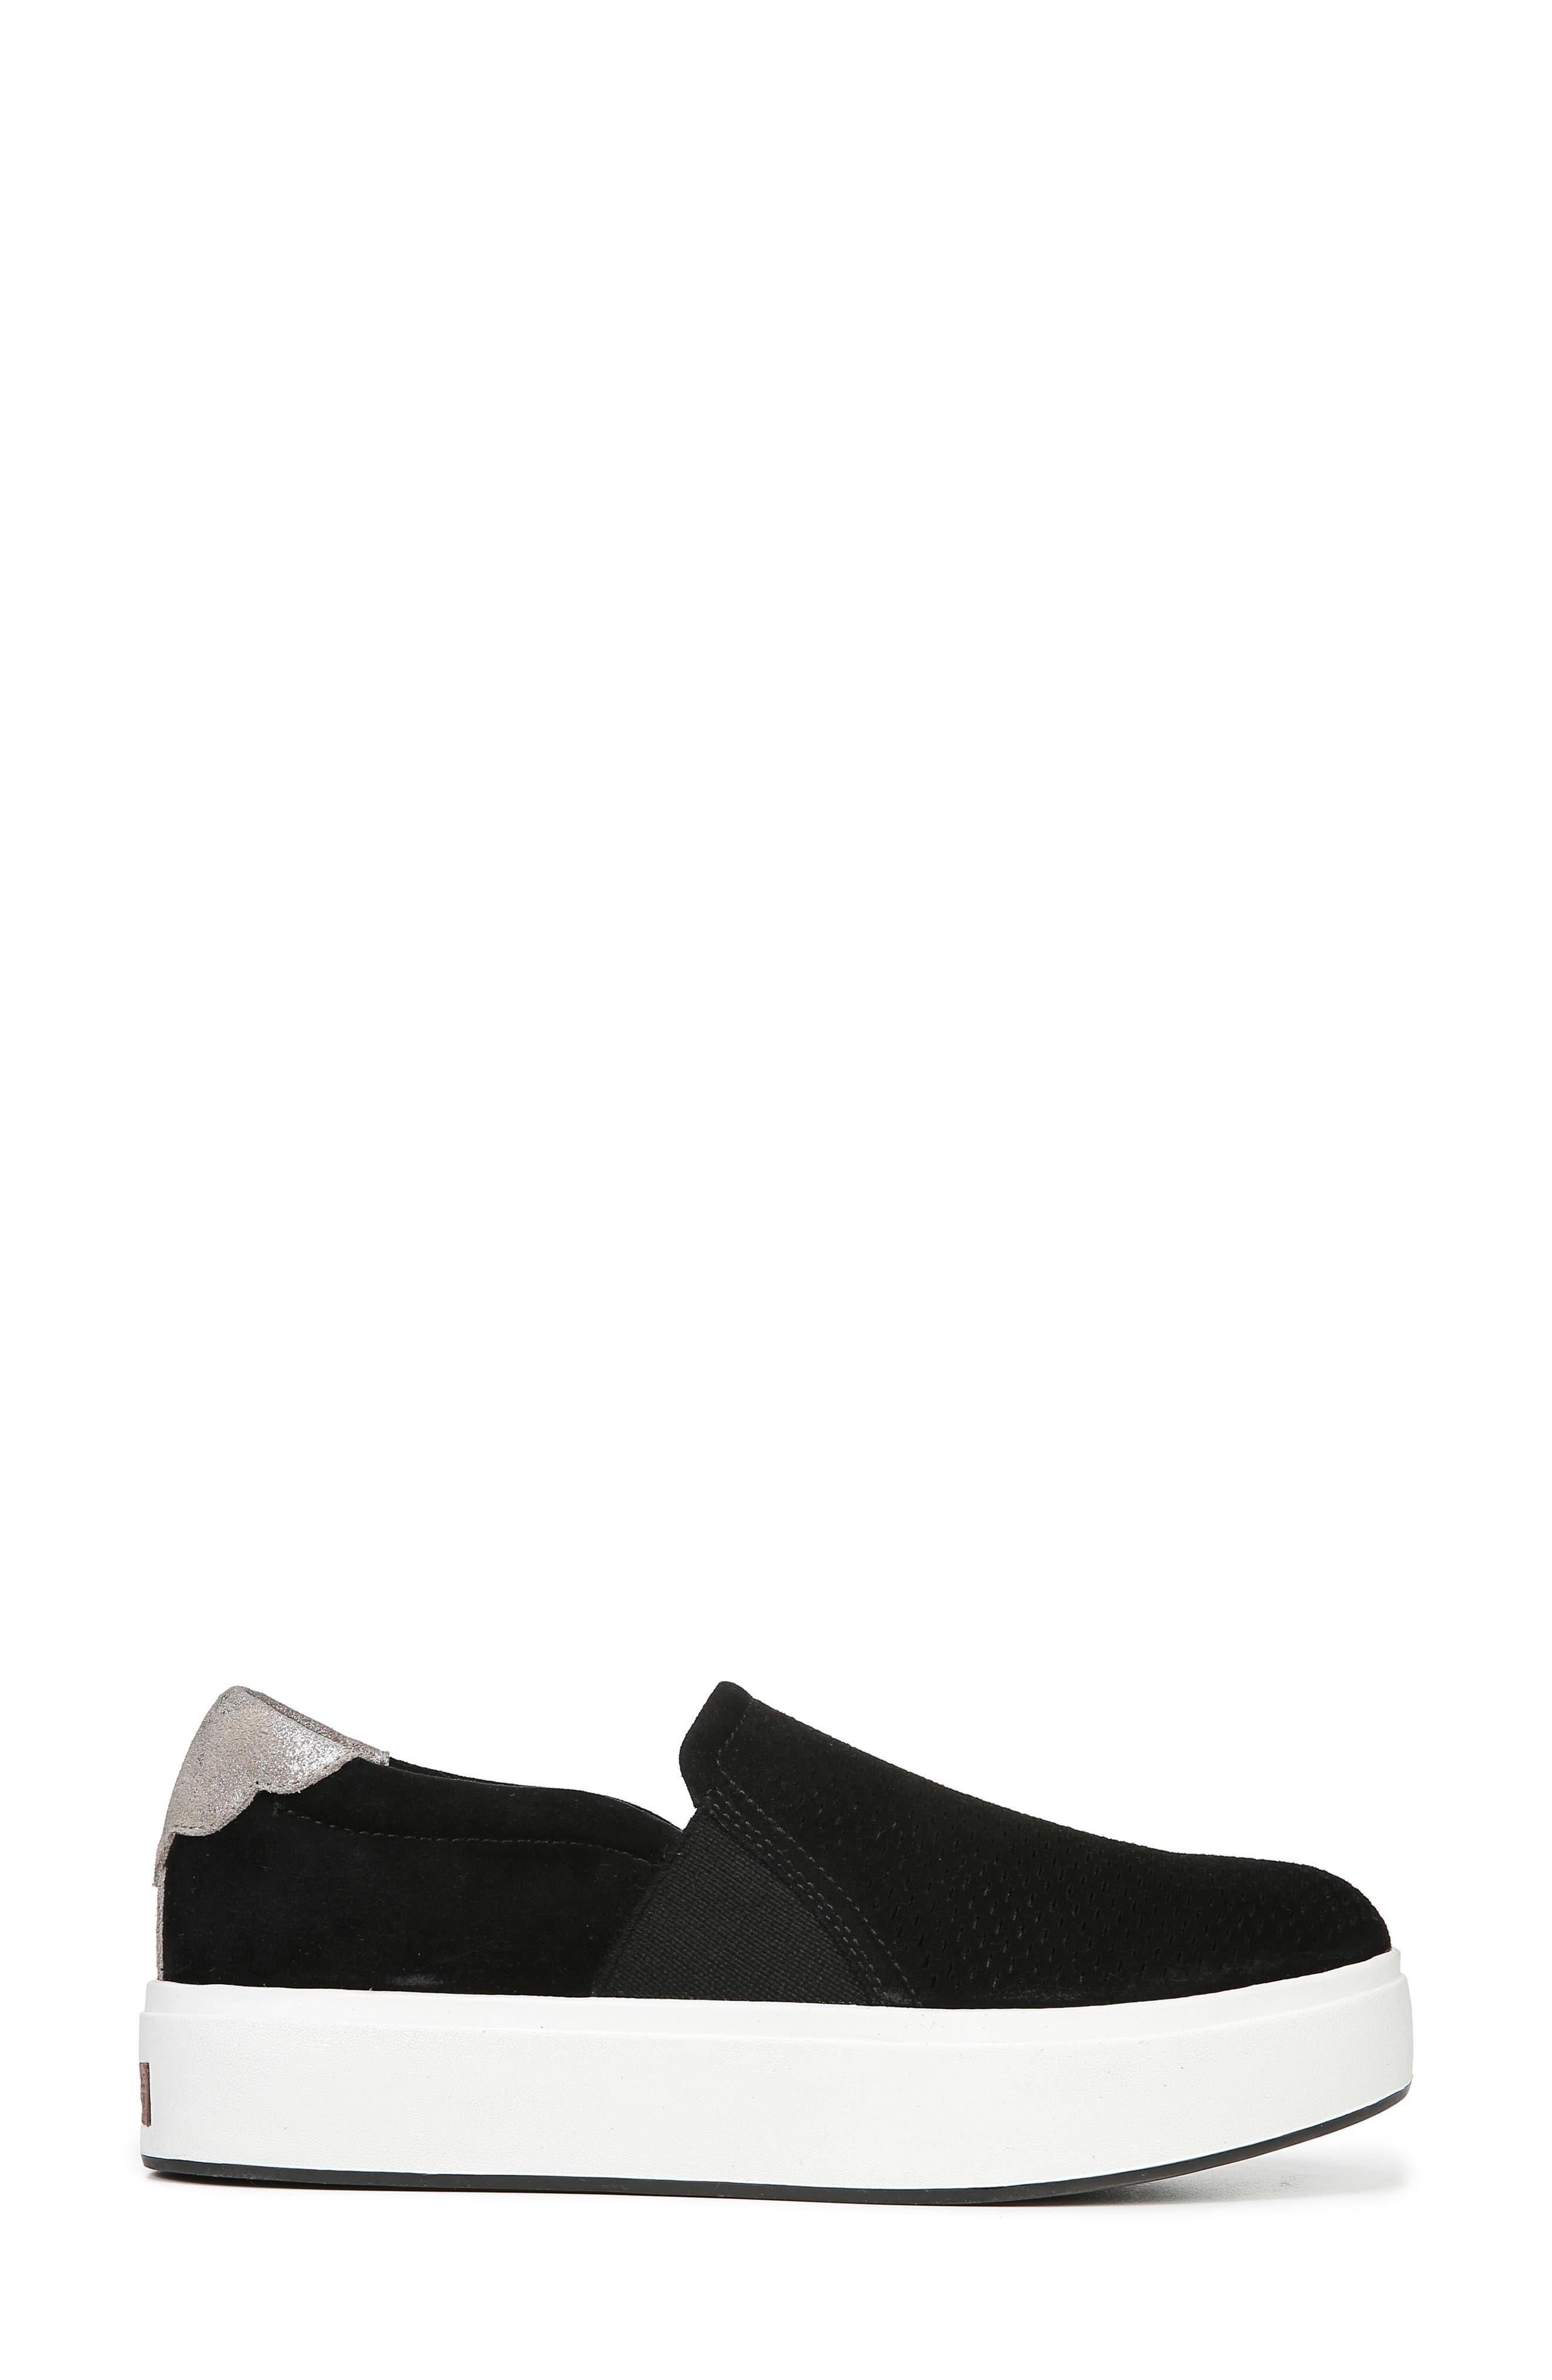 DR. SCHOLL'S, Abbot Lux Sneaker, Alternate thumbnail 3, color, BLACK SUEDE